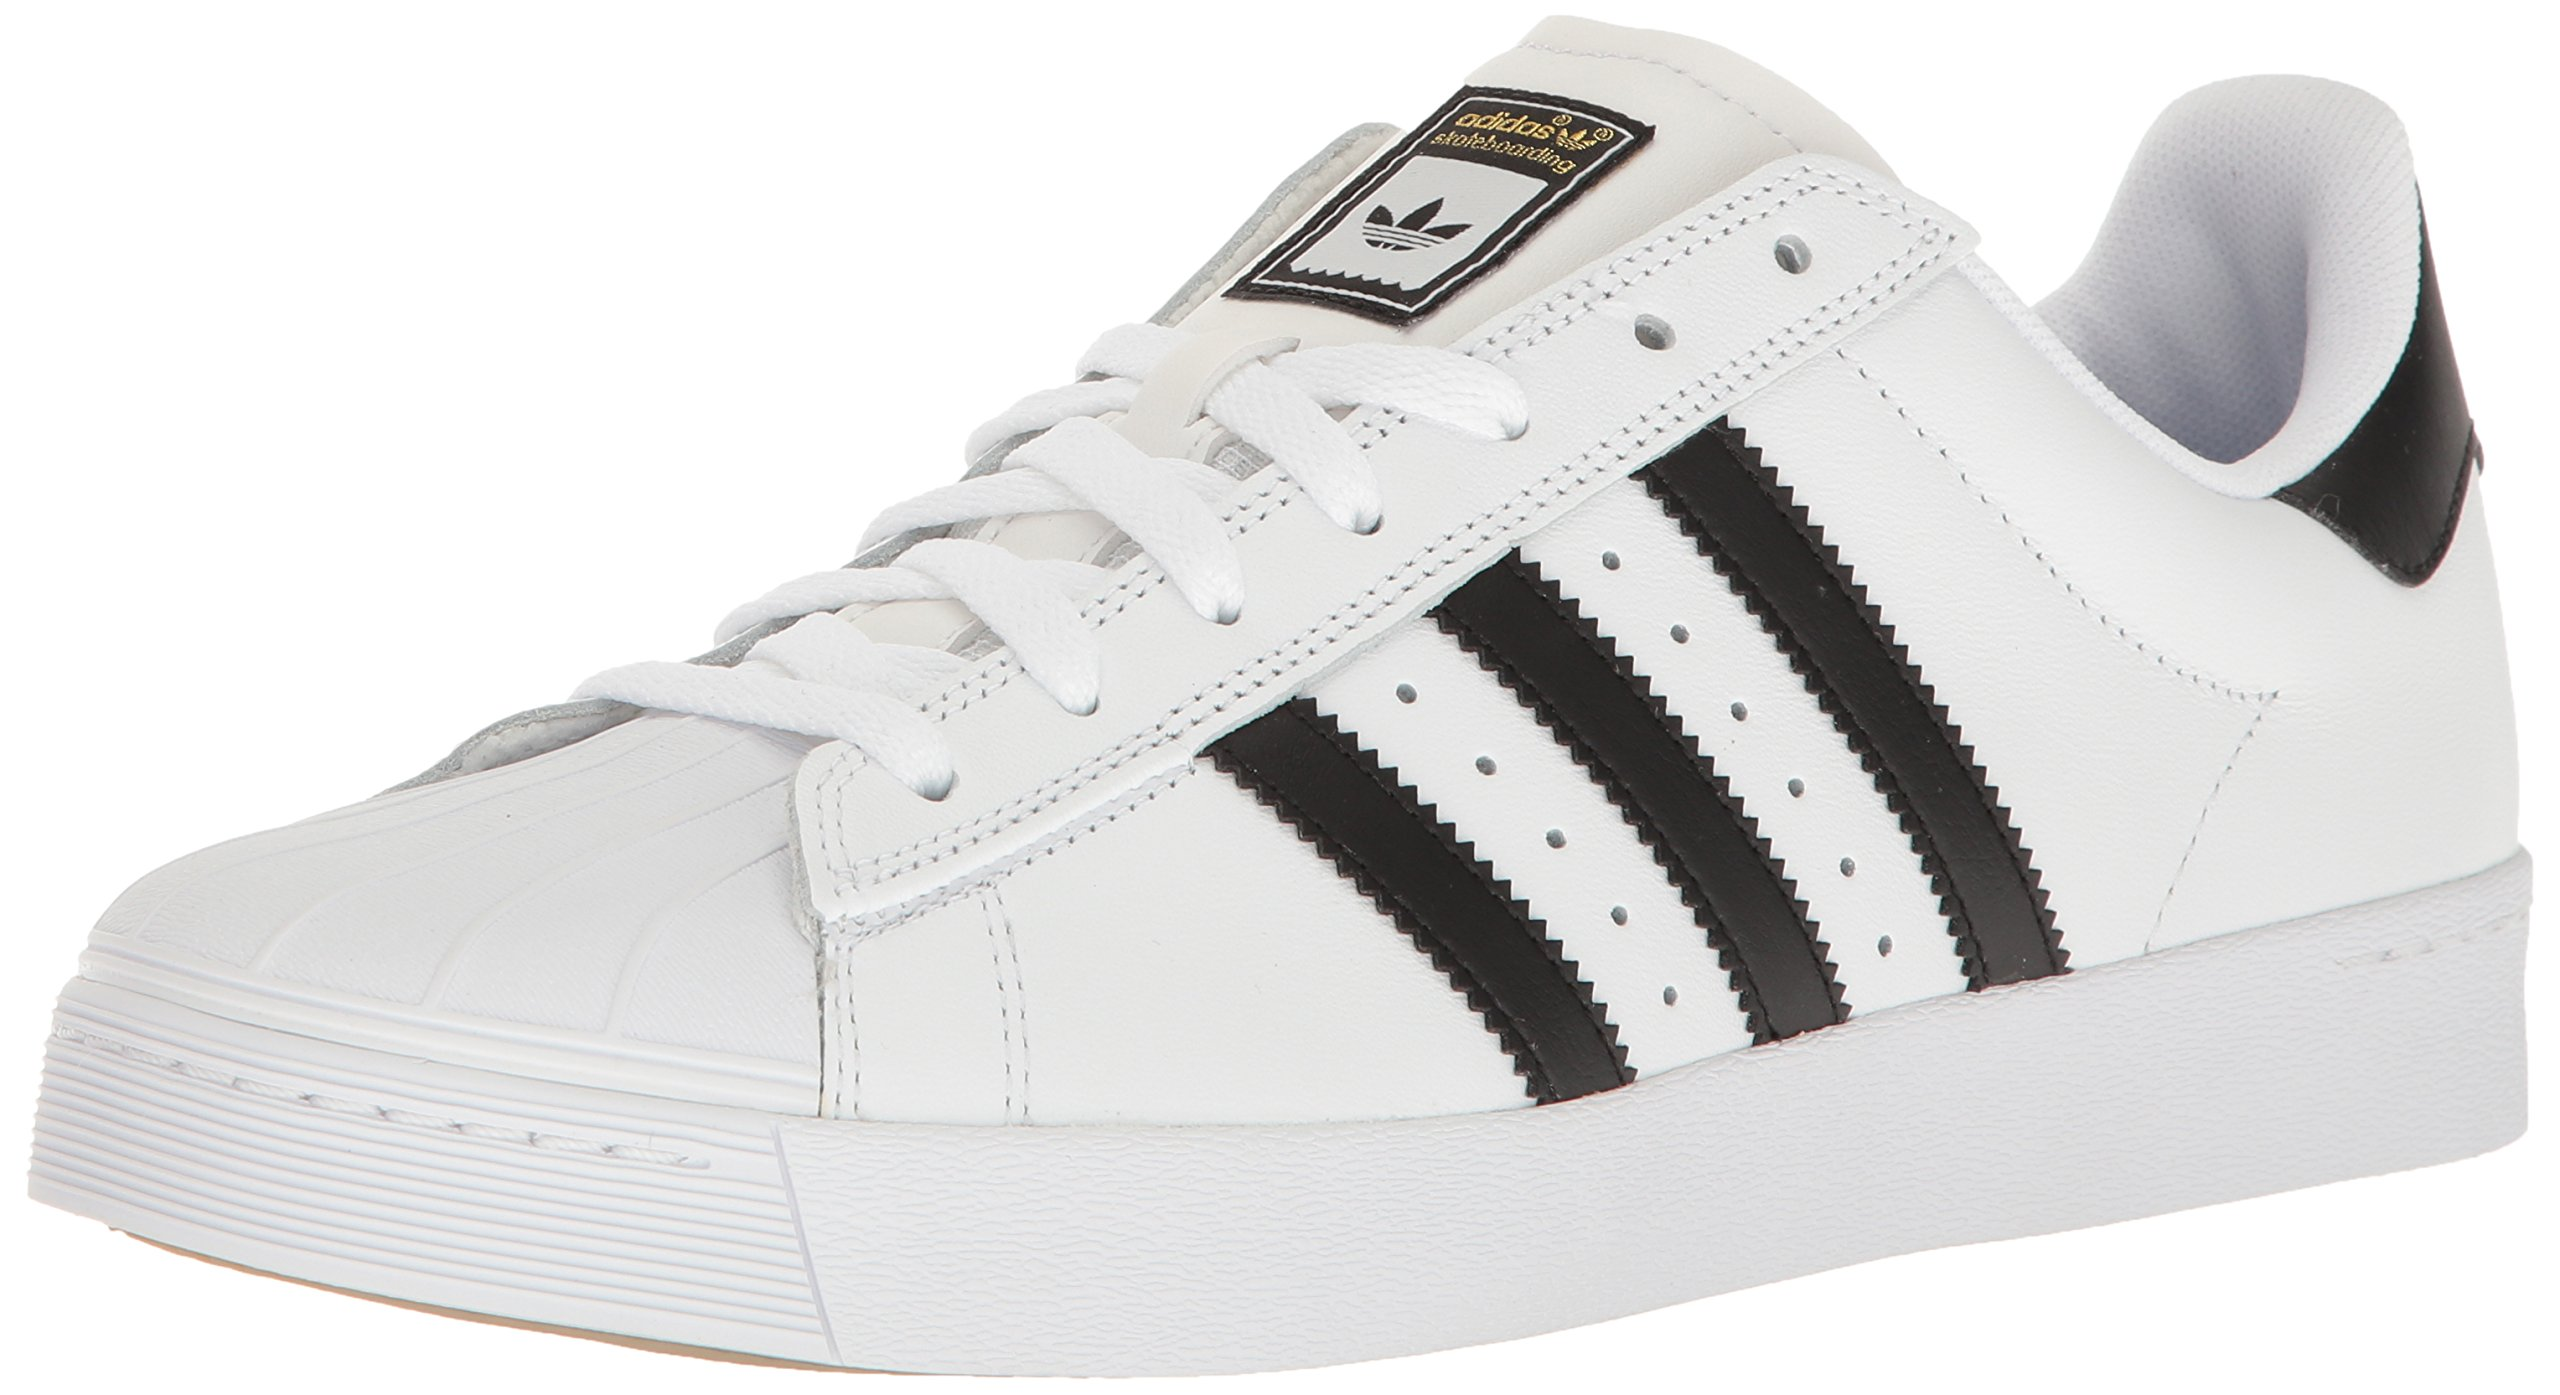 adidas Originals Men's Shoes | Superstar Vulc Adv, White/Core Black/White, (10.5 M US) by adidas Originals